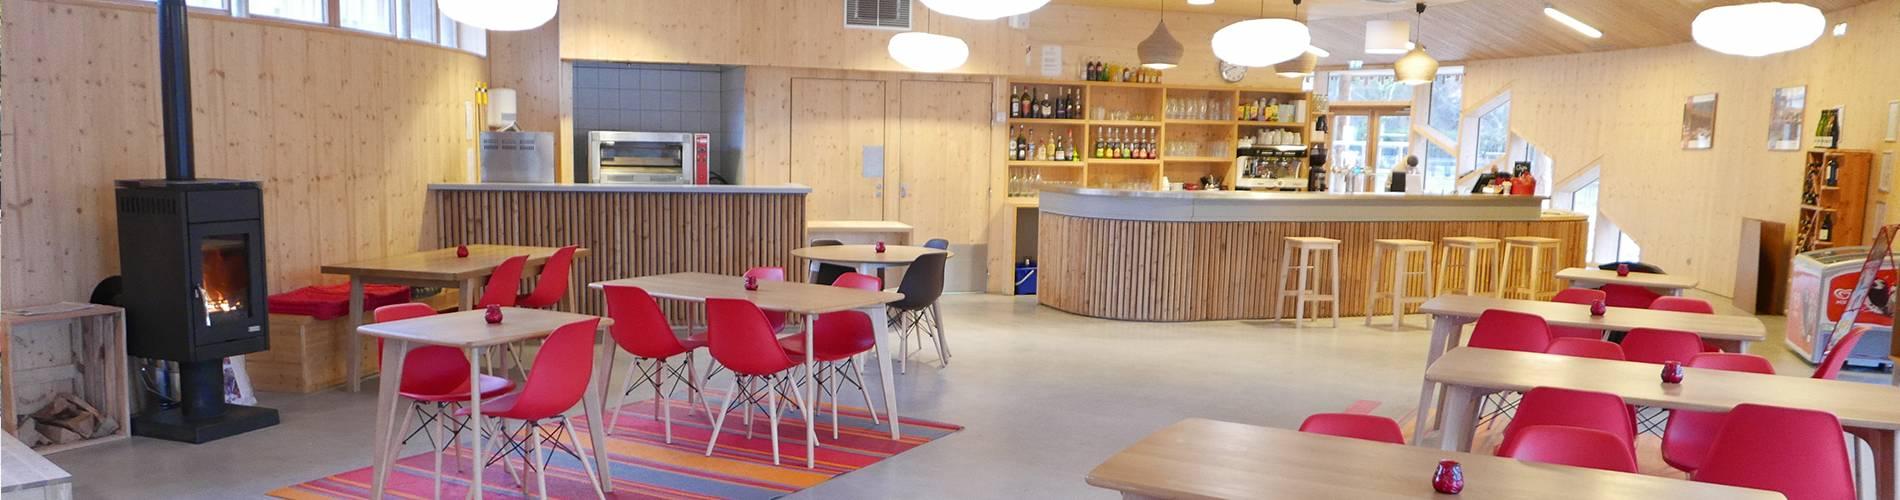 camping-strasbourg-cafe-resto